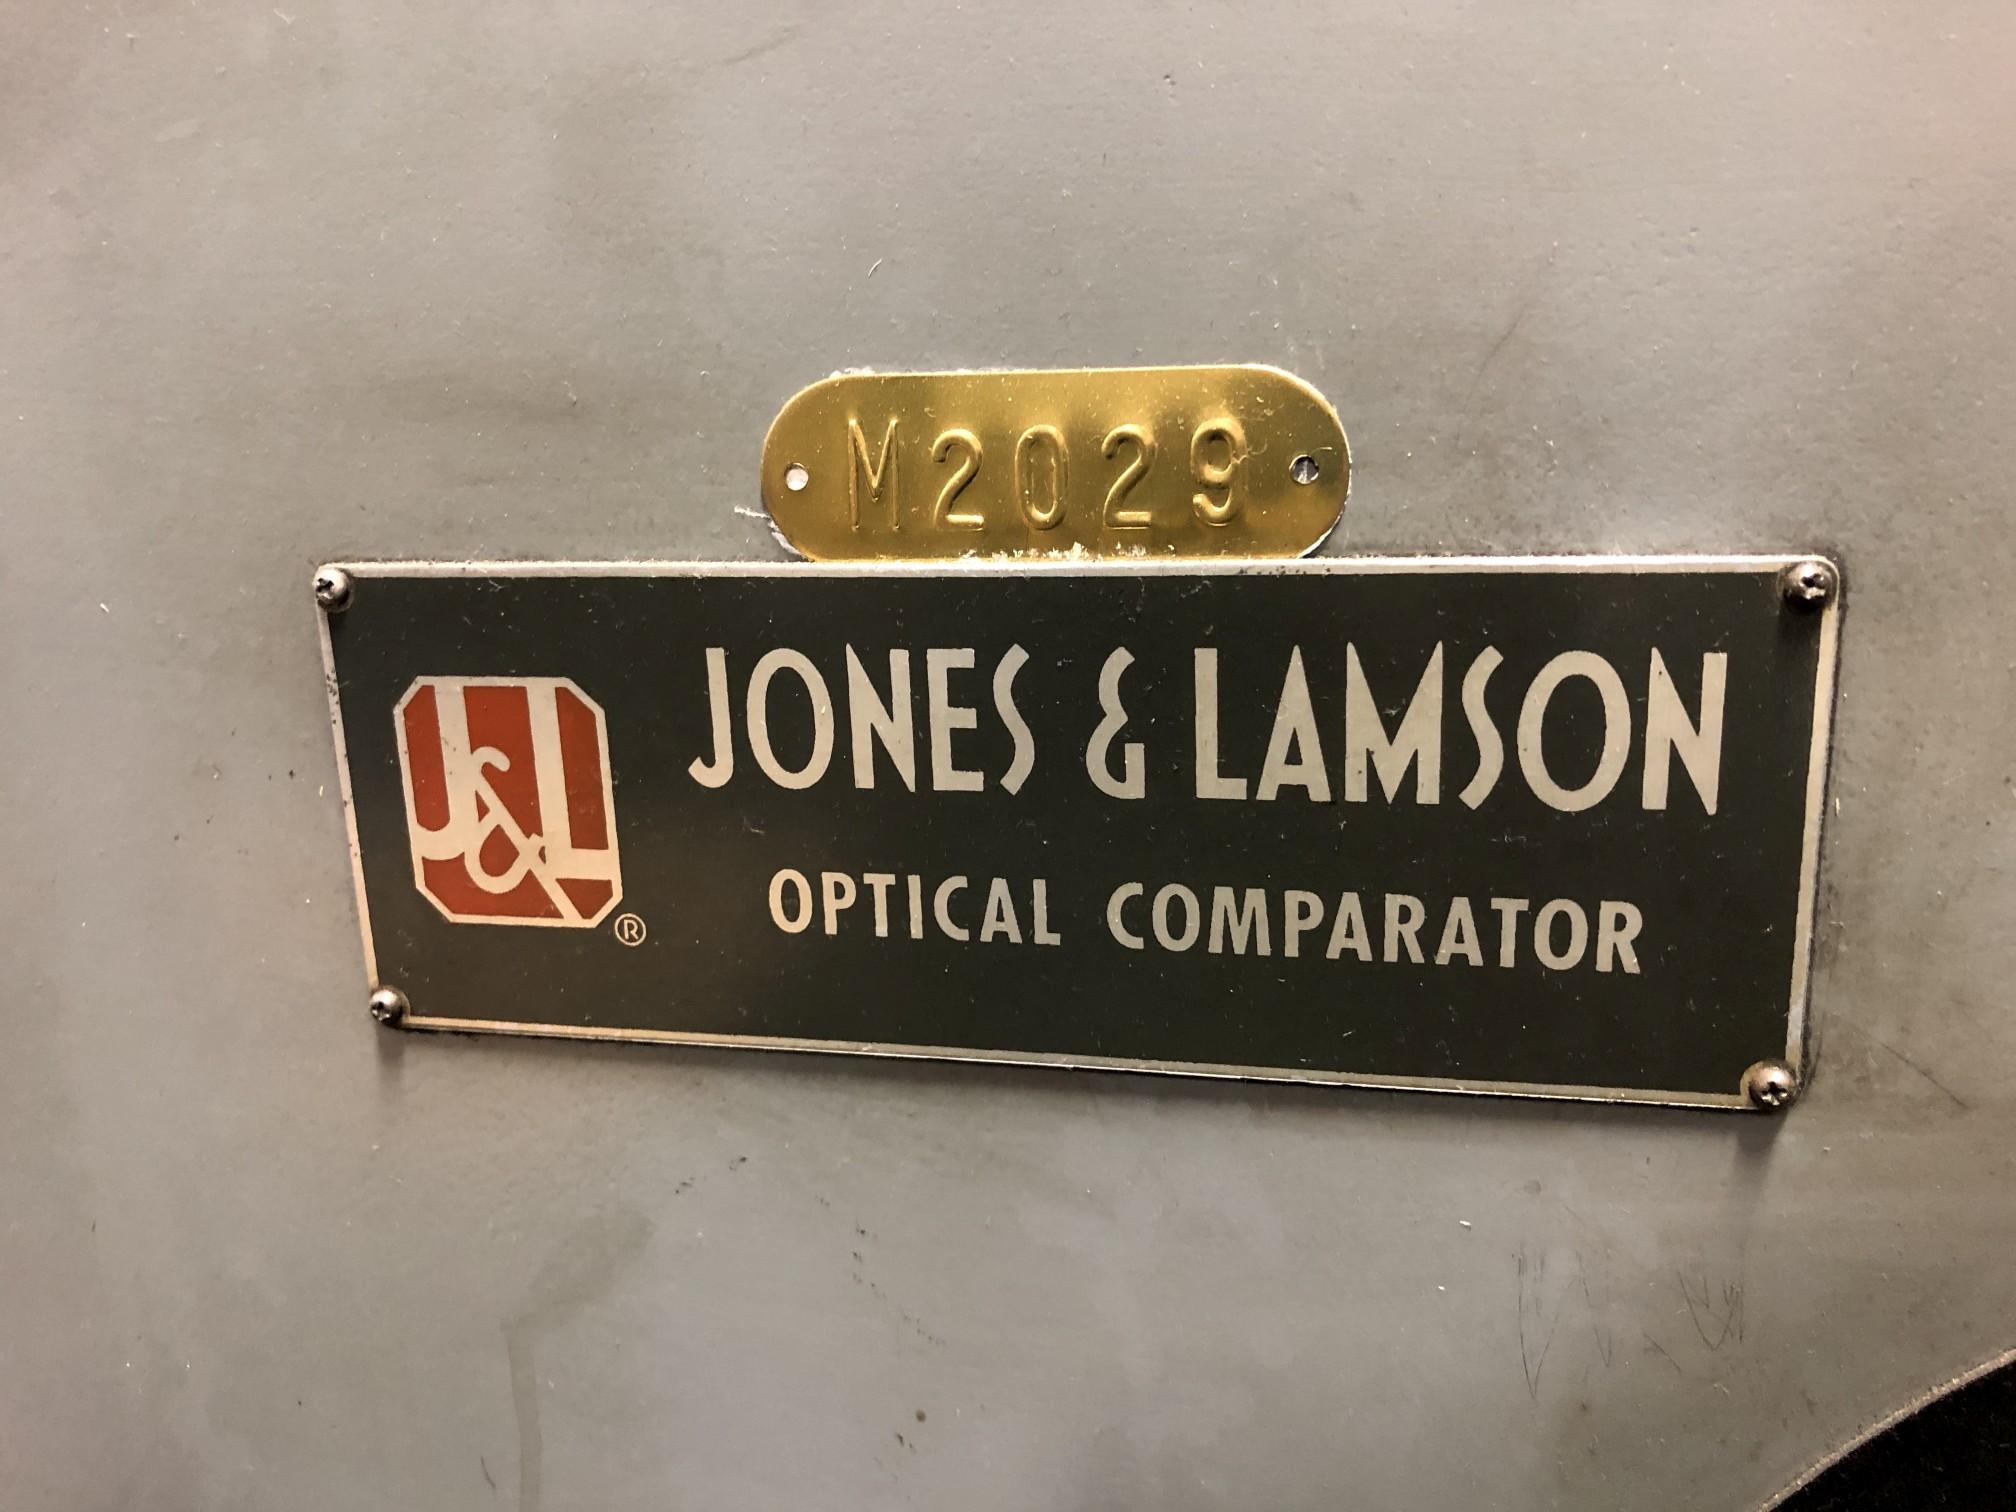 "Jones & Lamson 14"" Optical Comparator - Image 7 of 7"